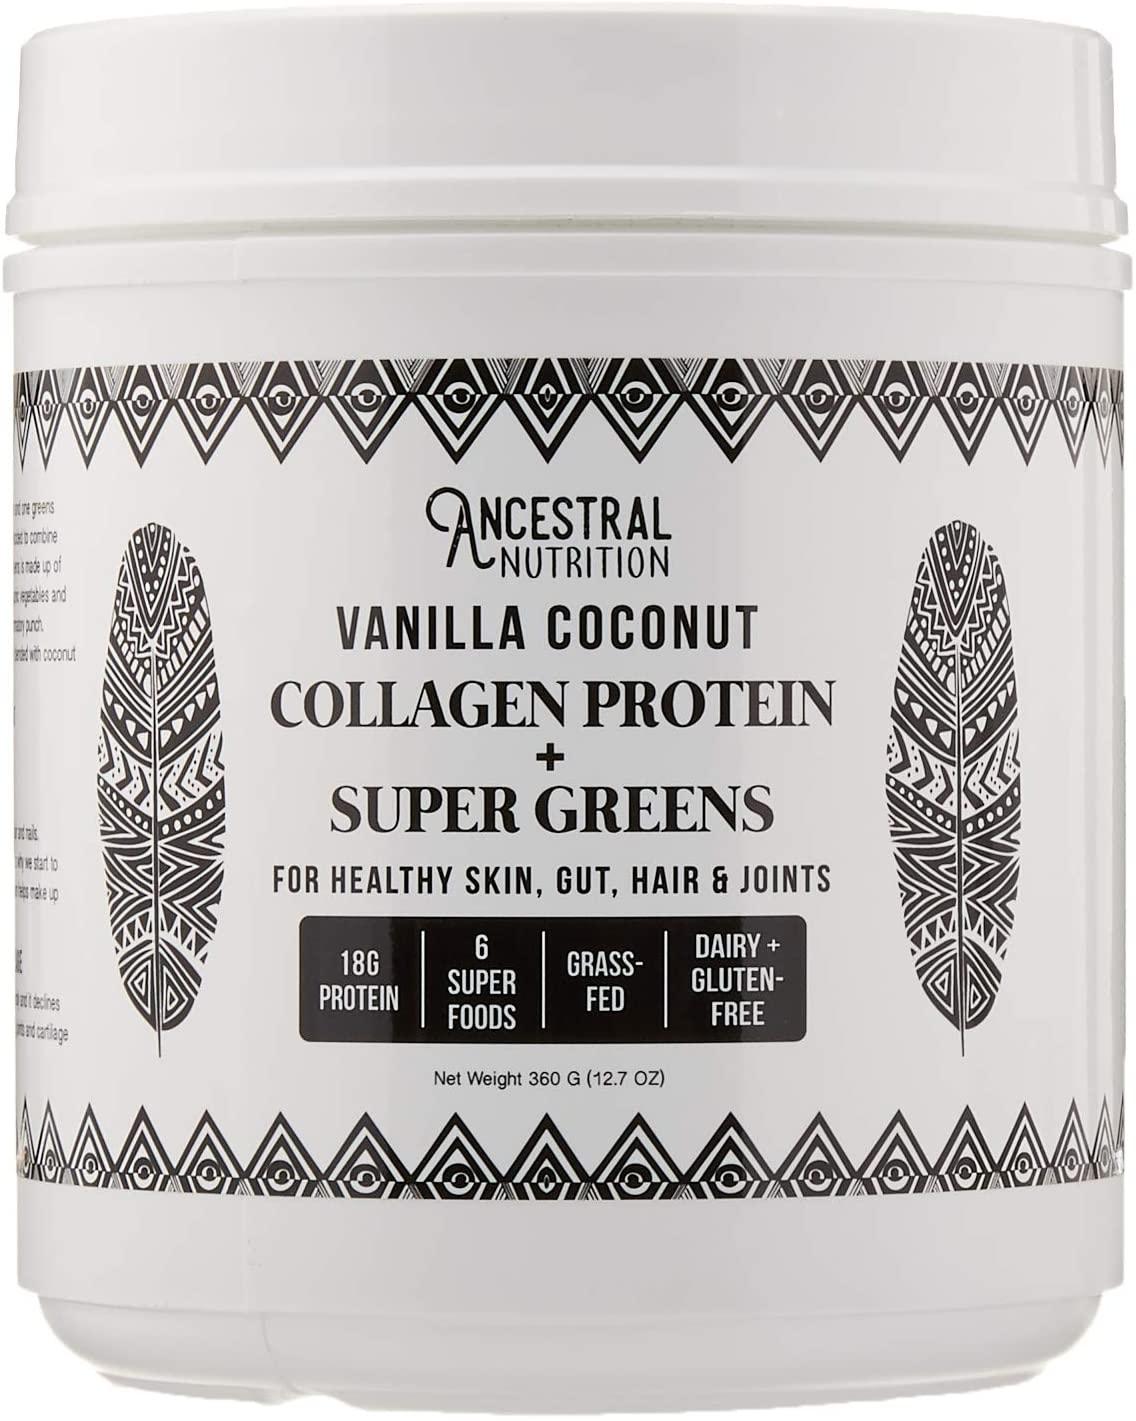 Collagen Protein and SuperGreens